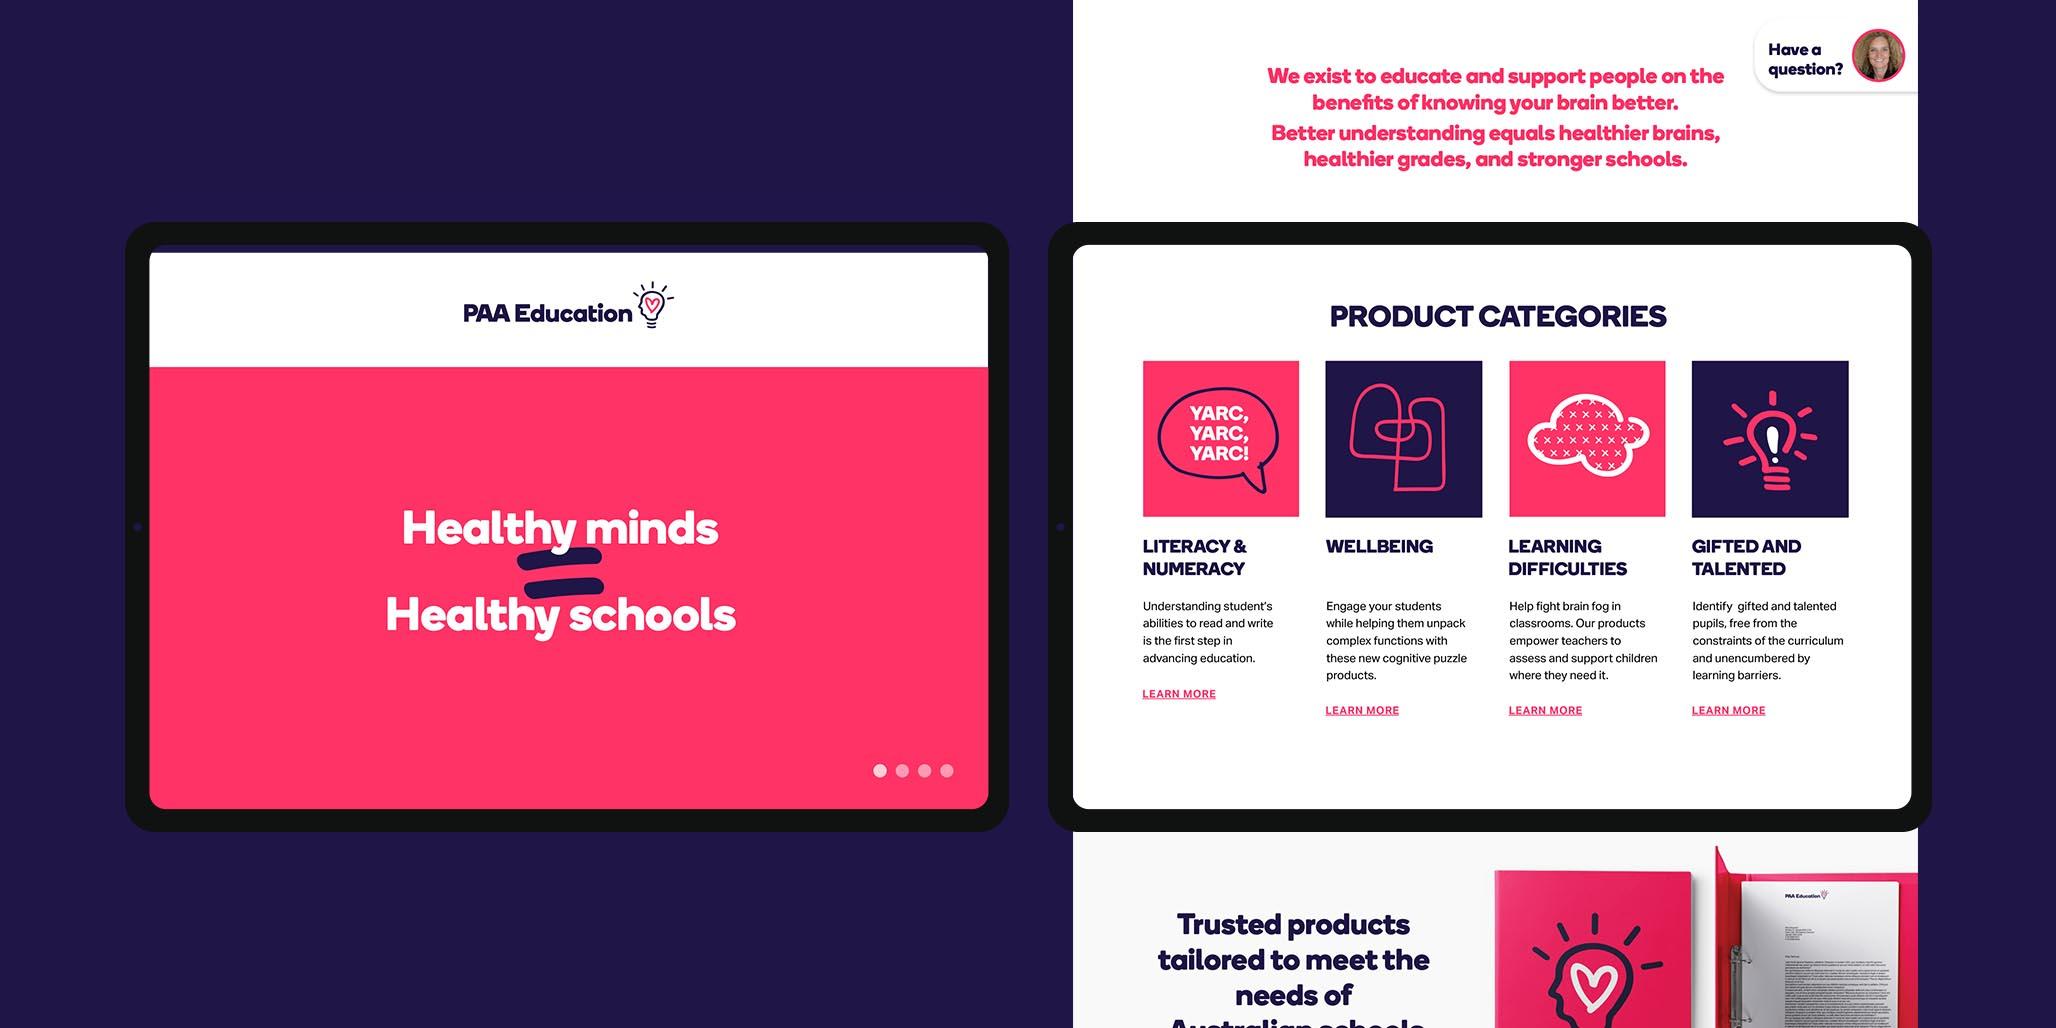 Branding Services & Website Design project for PAA Education, Sydney, Australia, image landscape J